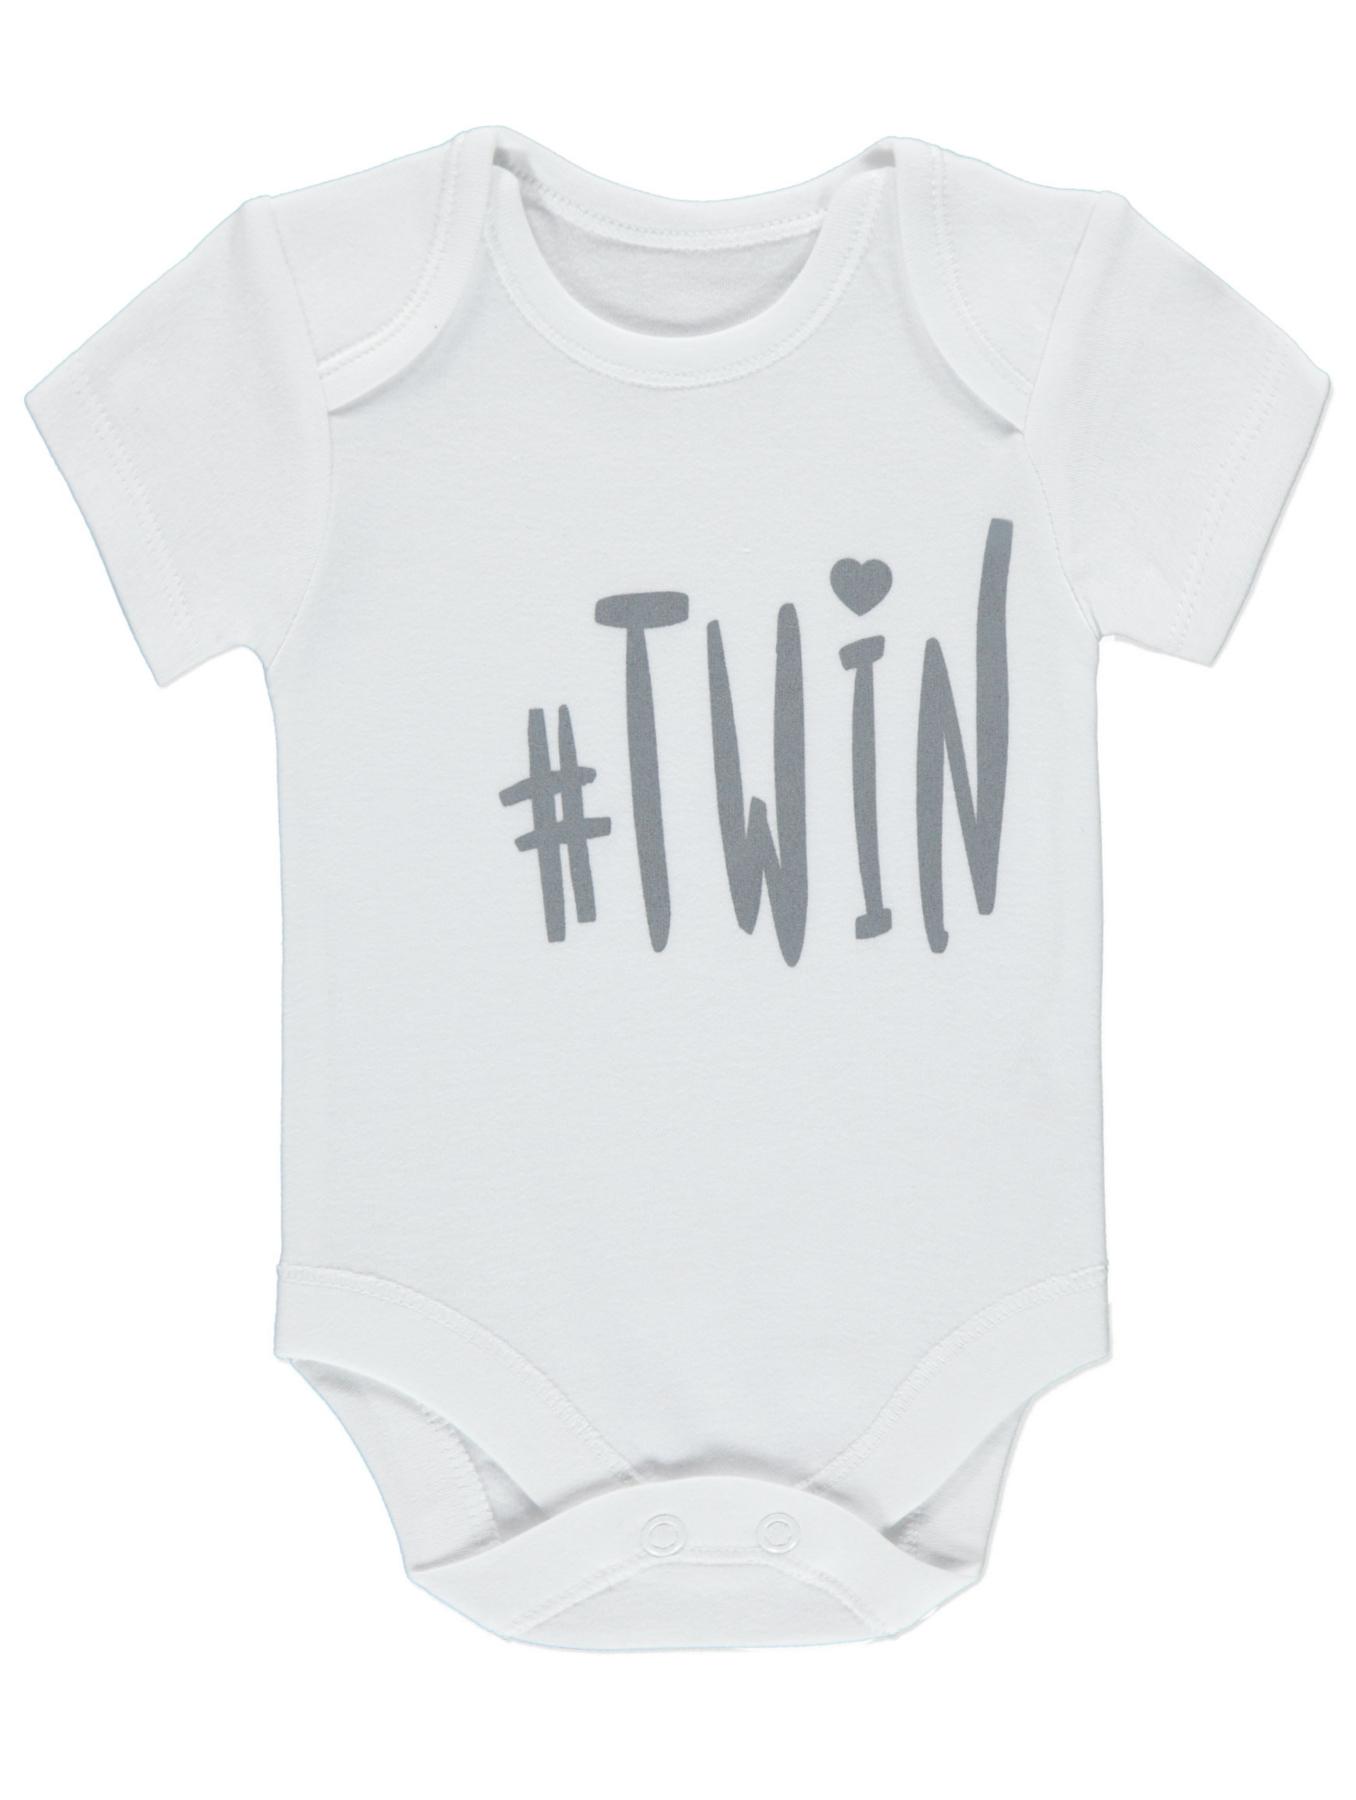 Twinning Twin Bodysuits Baby